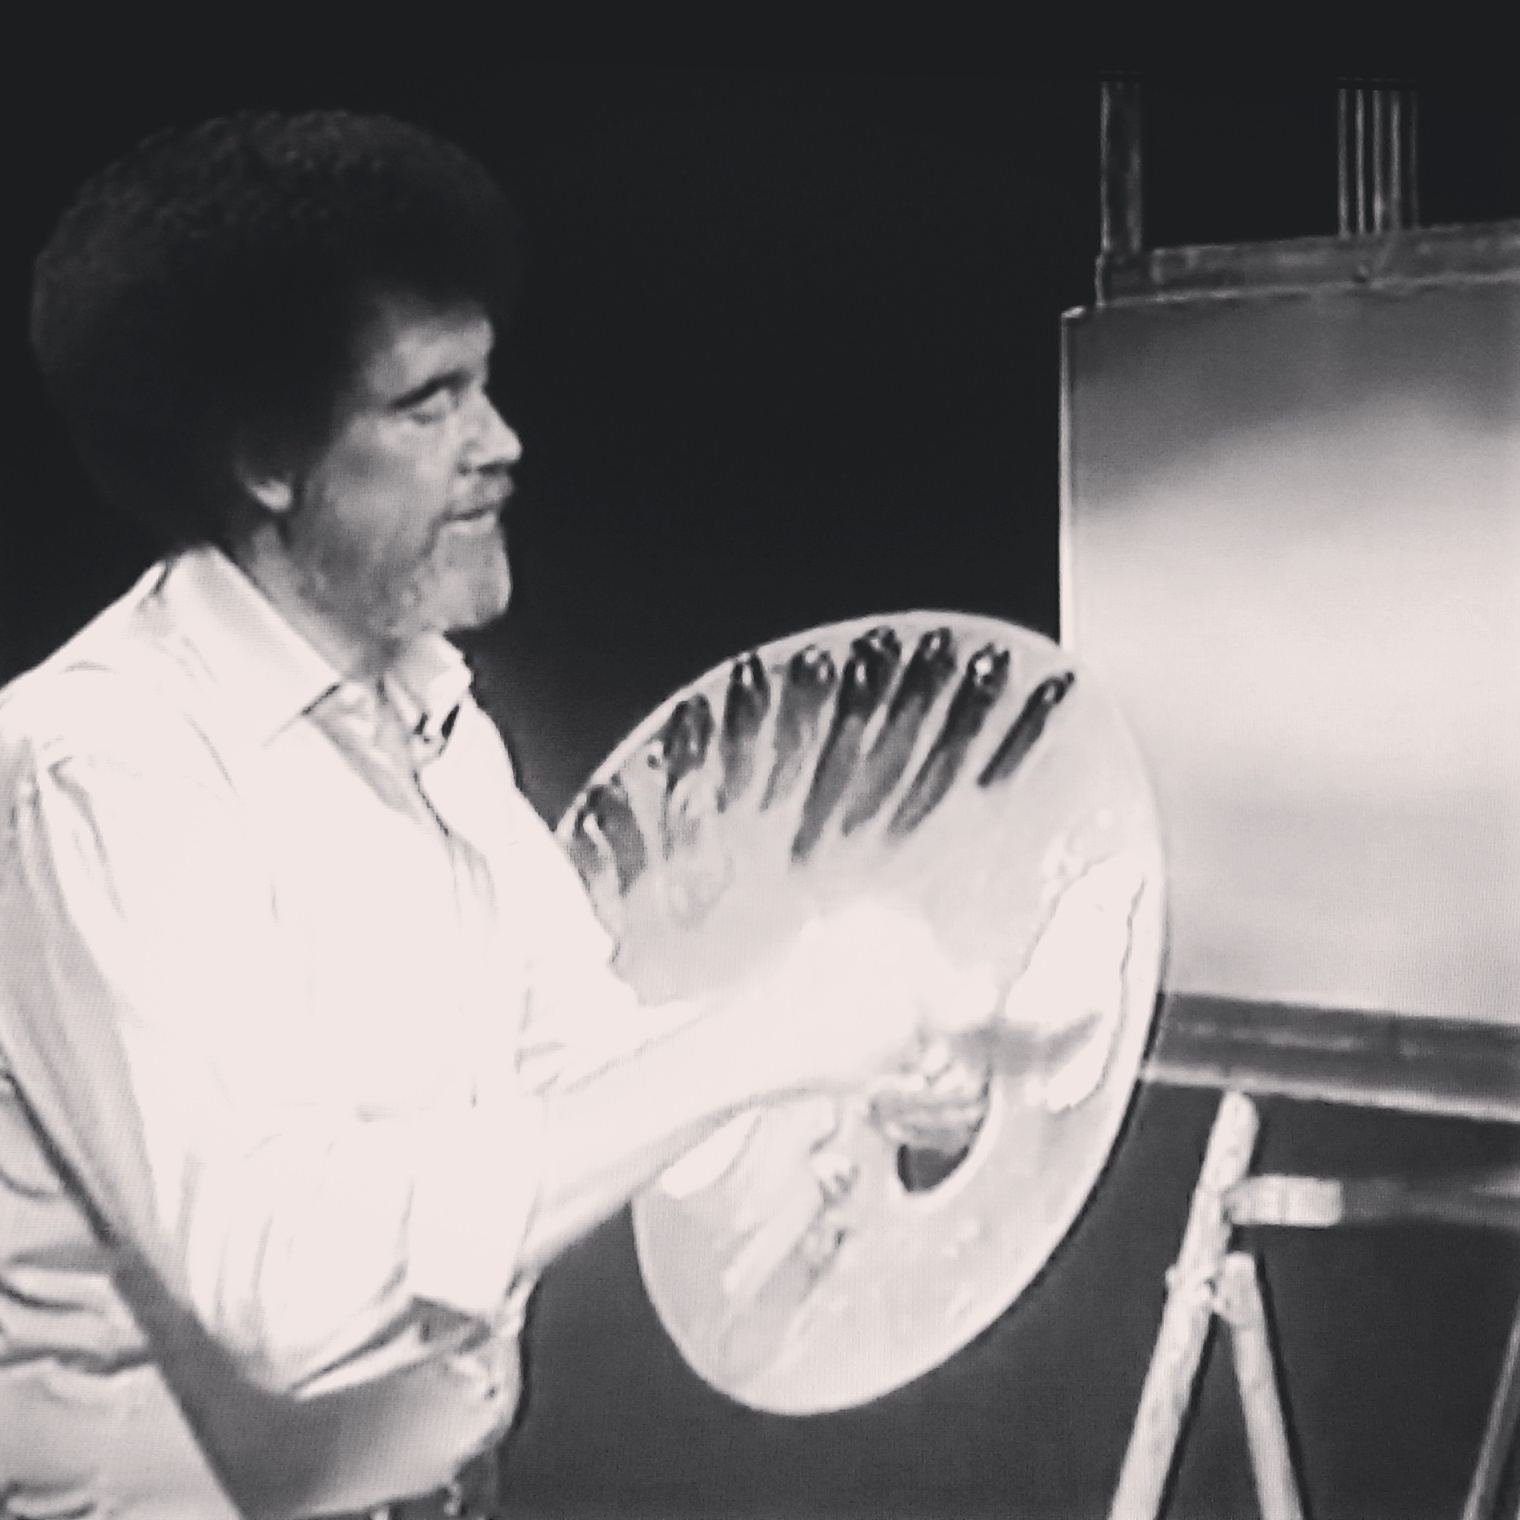 Bob Ross on twitch!!! Yaaaassss #art #arts #bobross #painting Twitch.tv/bobross